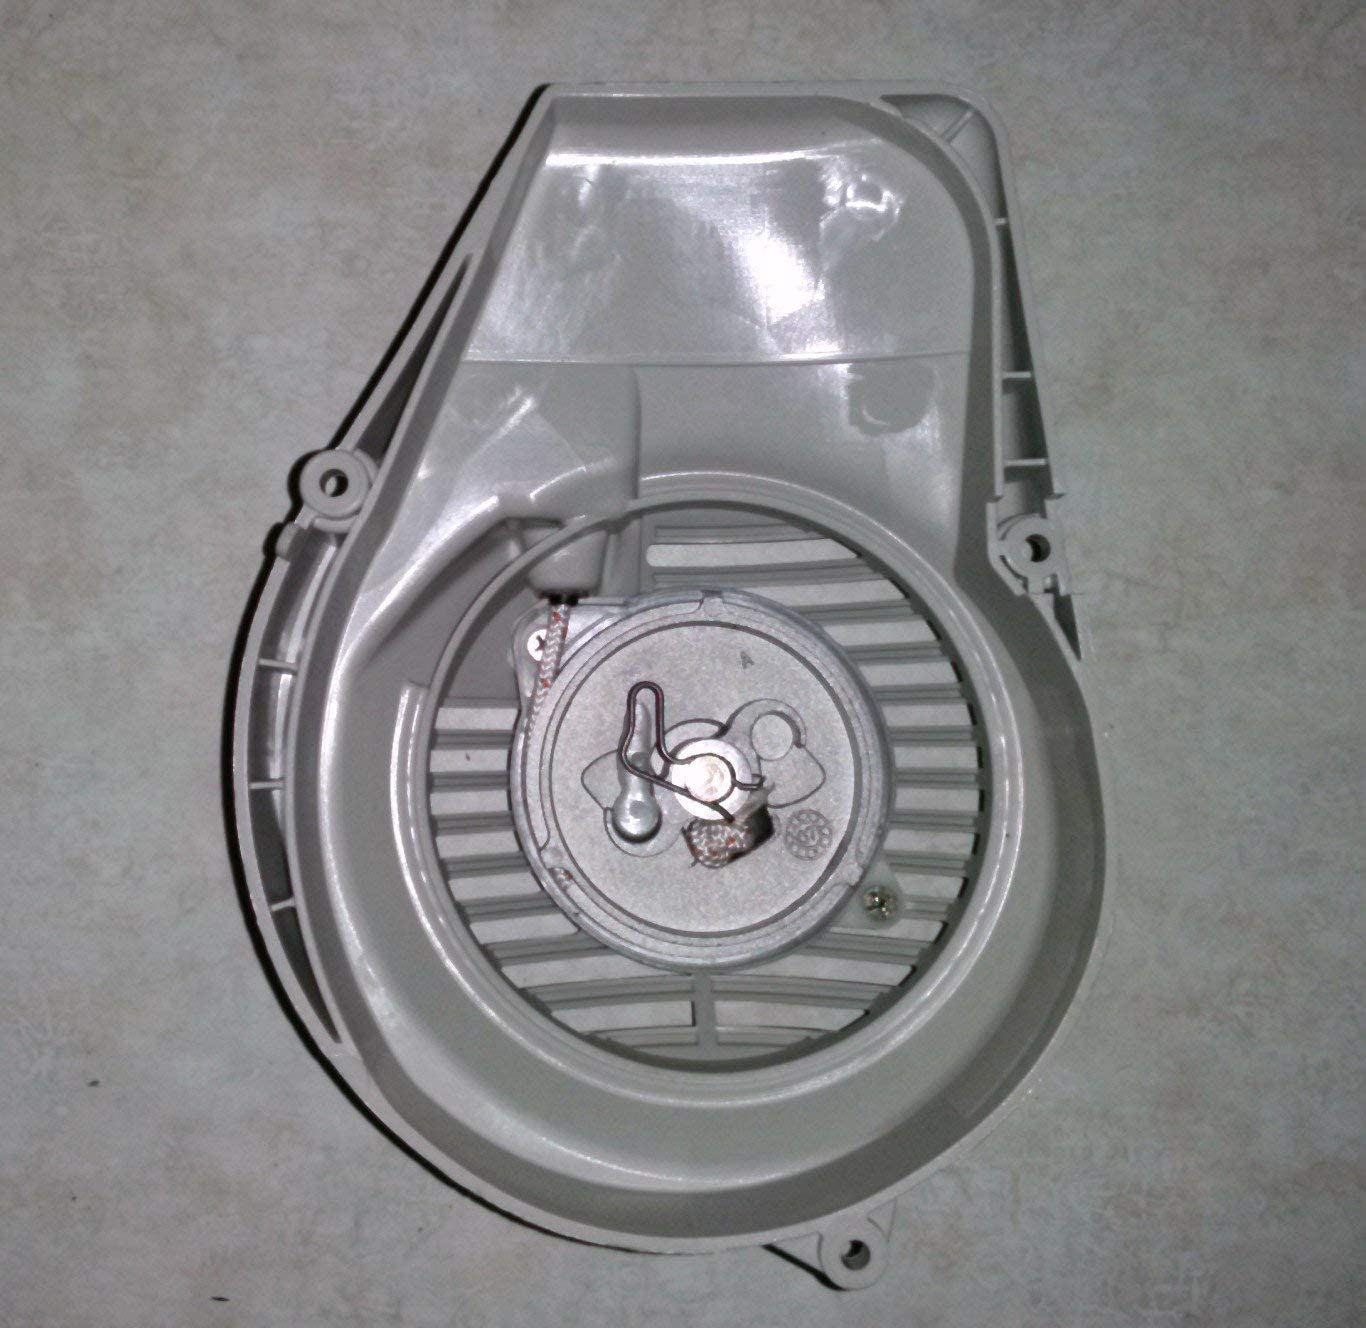 Starter cap for STIHL TS 350 TS 360 TS350 TS360 onwards KW27, 1994